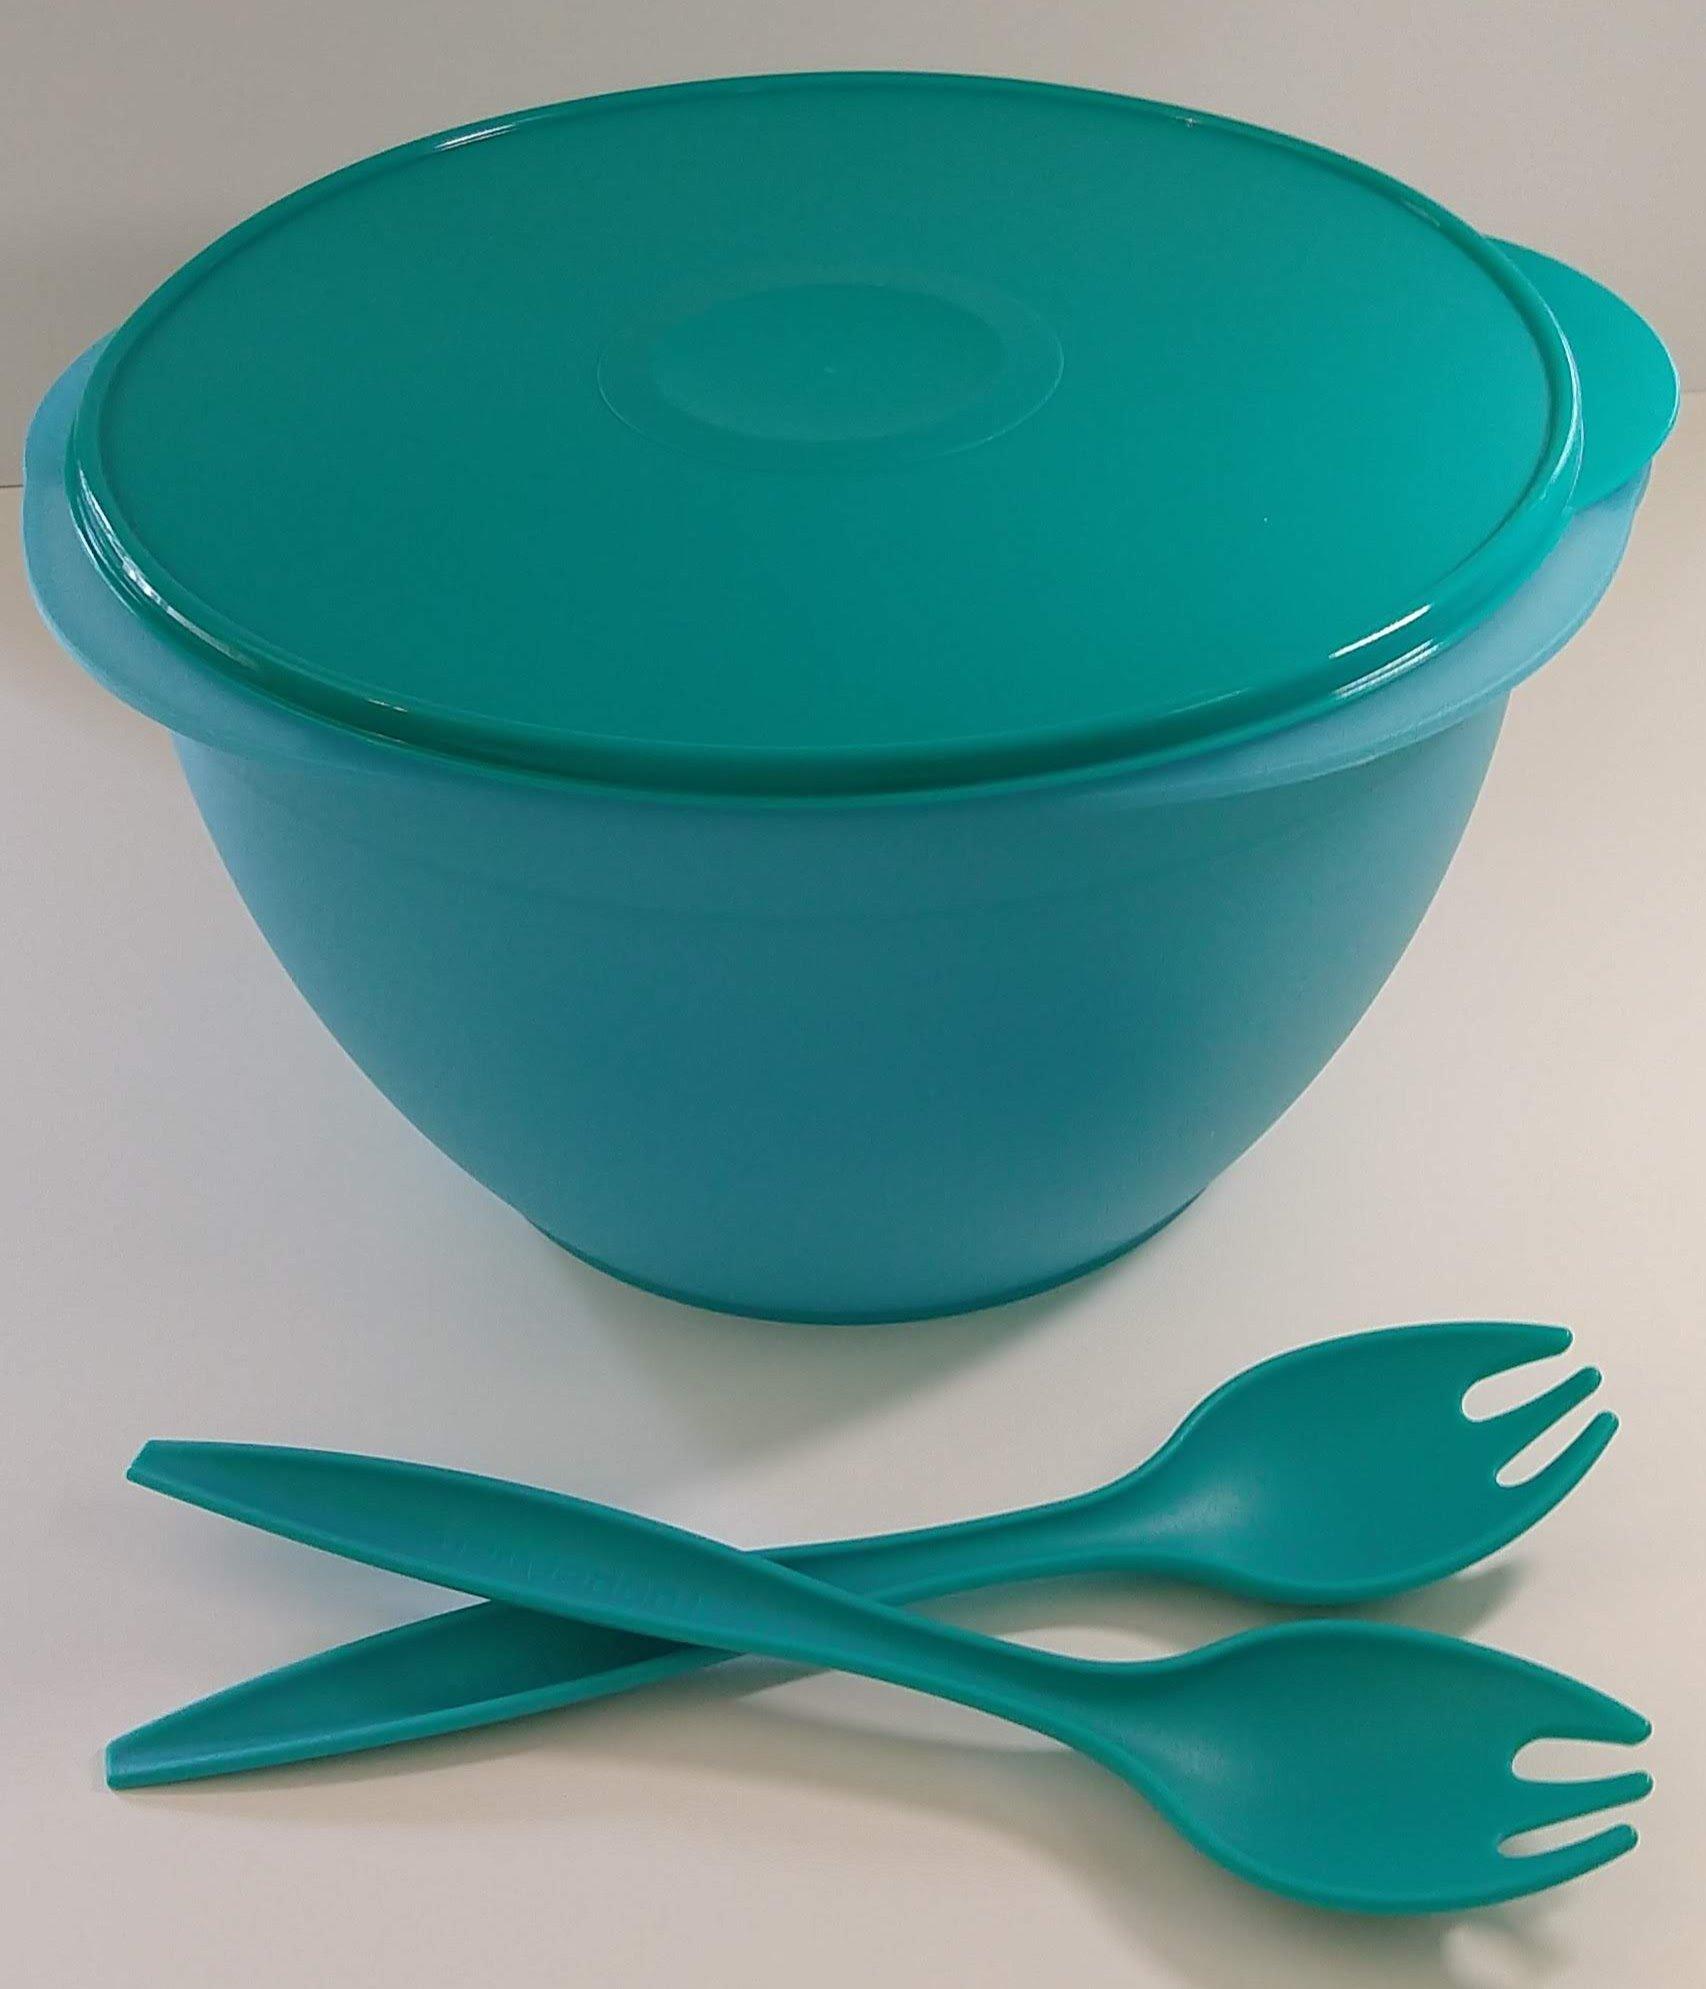 Tupperware Maxi Salad Bowl Set in Parrotfish